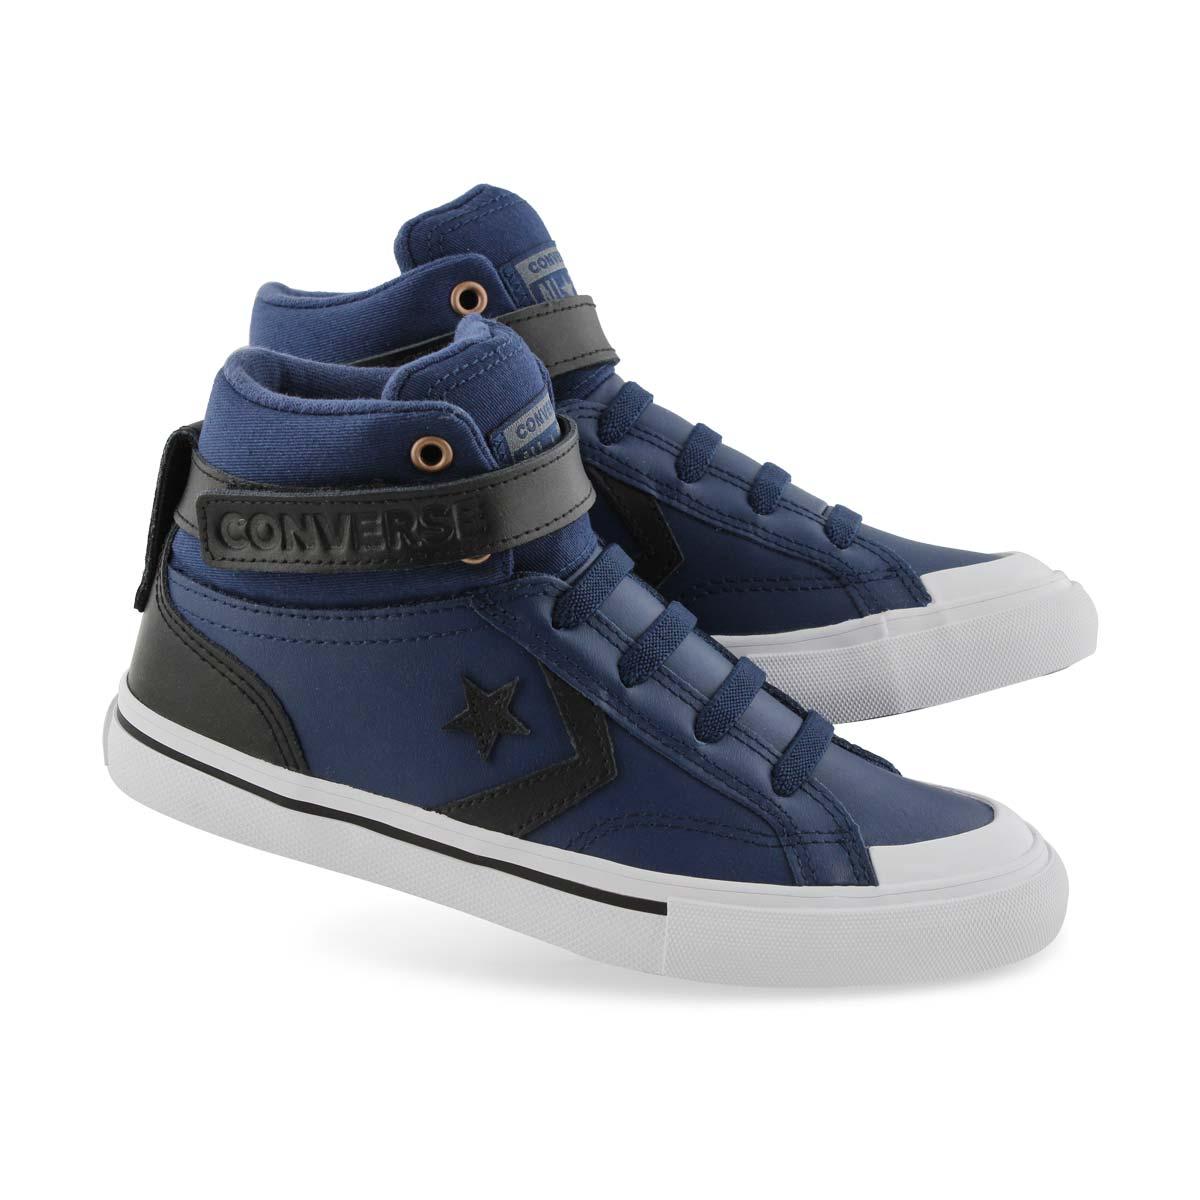 Details about Converse Boys' Pro Blaze Strap Martian Hi Sneaker